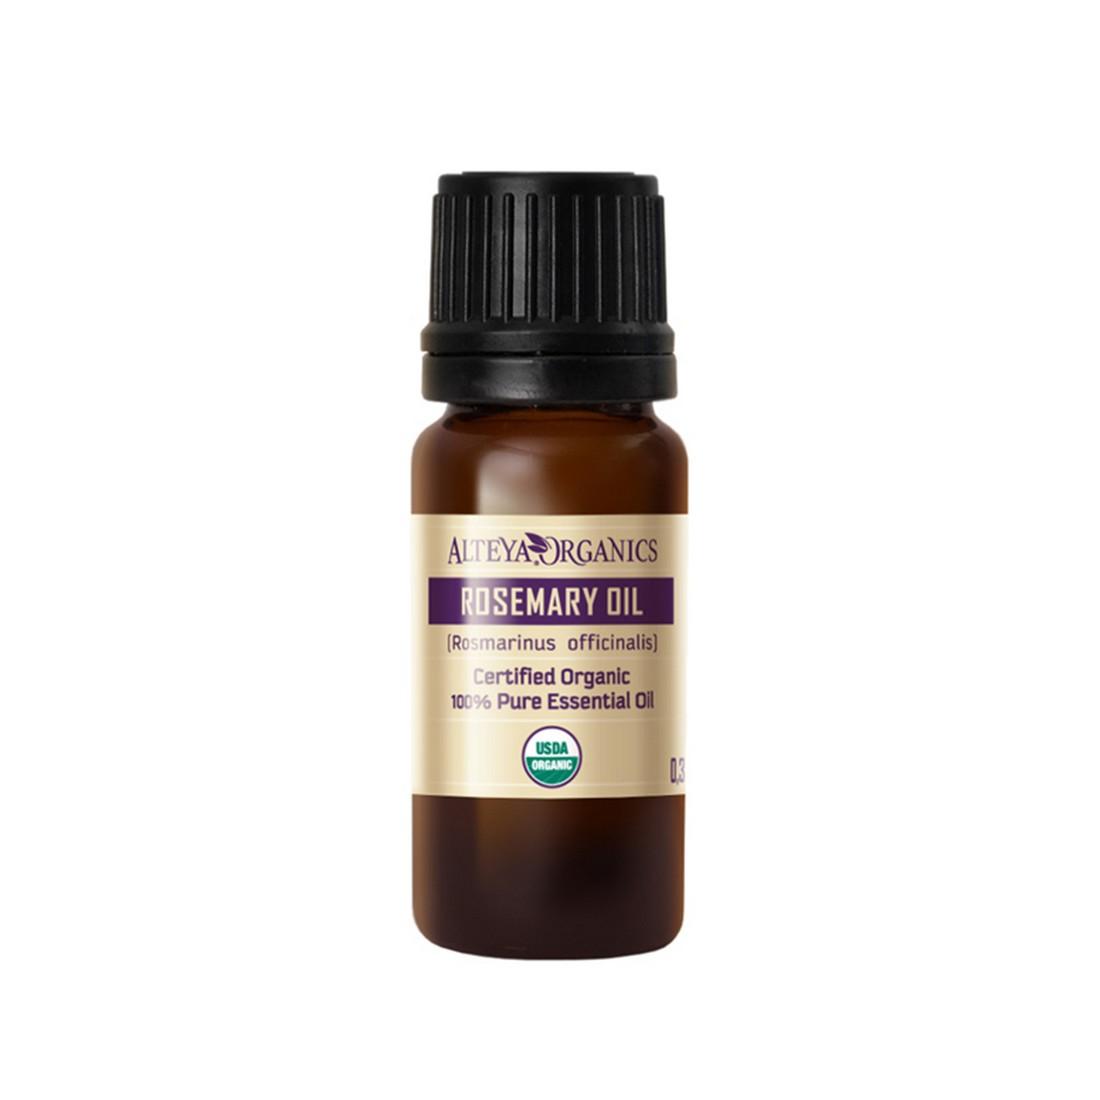 Bio organic rosemary essential oil Alteya Organics 10 ml.